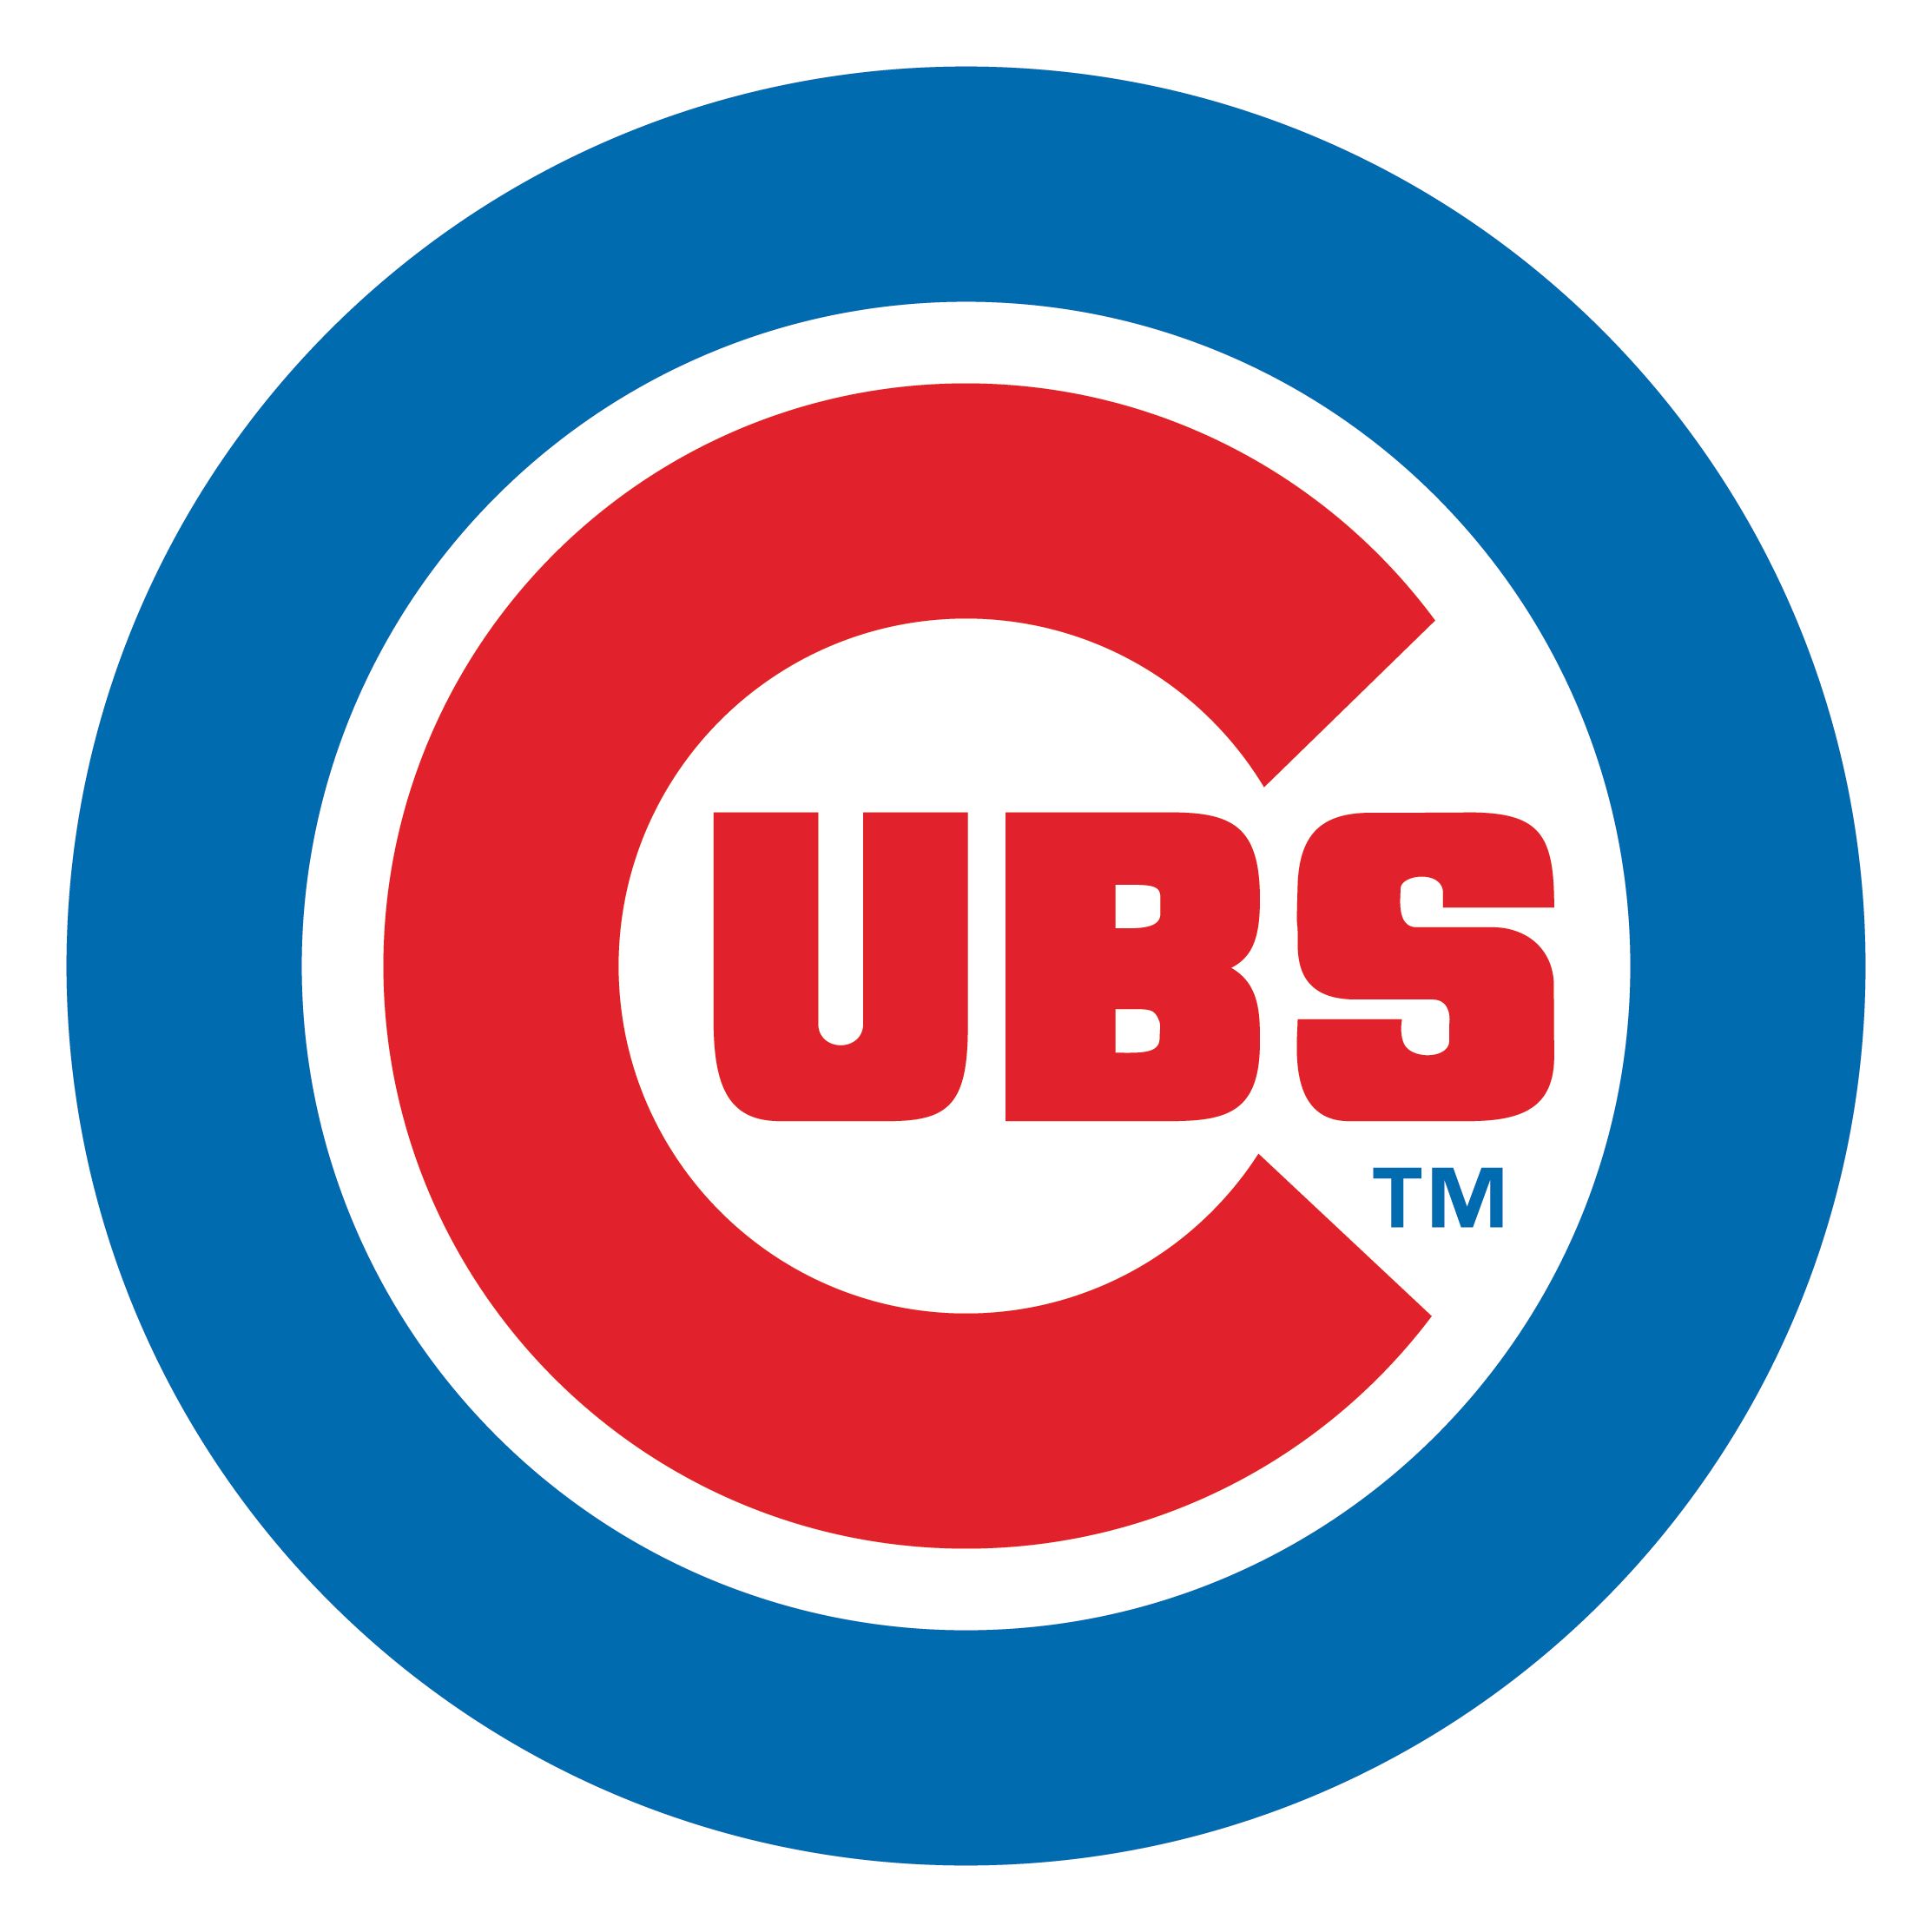 Chicago cubs logo vector. Fan clipart sport fanatic